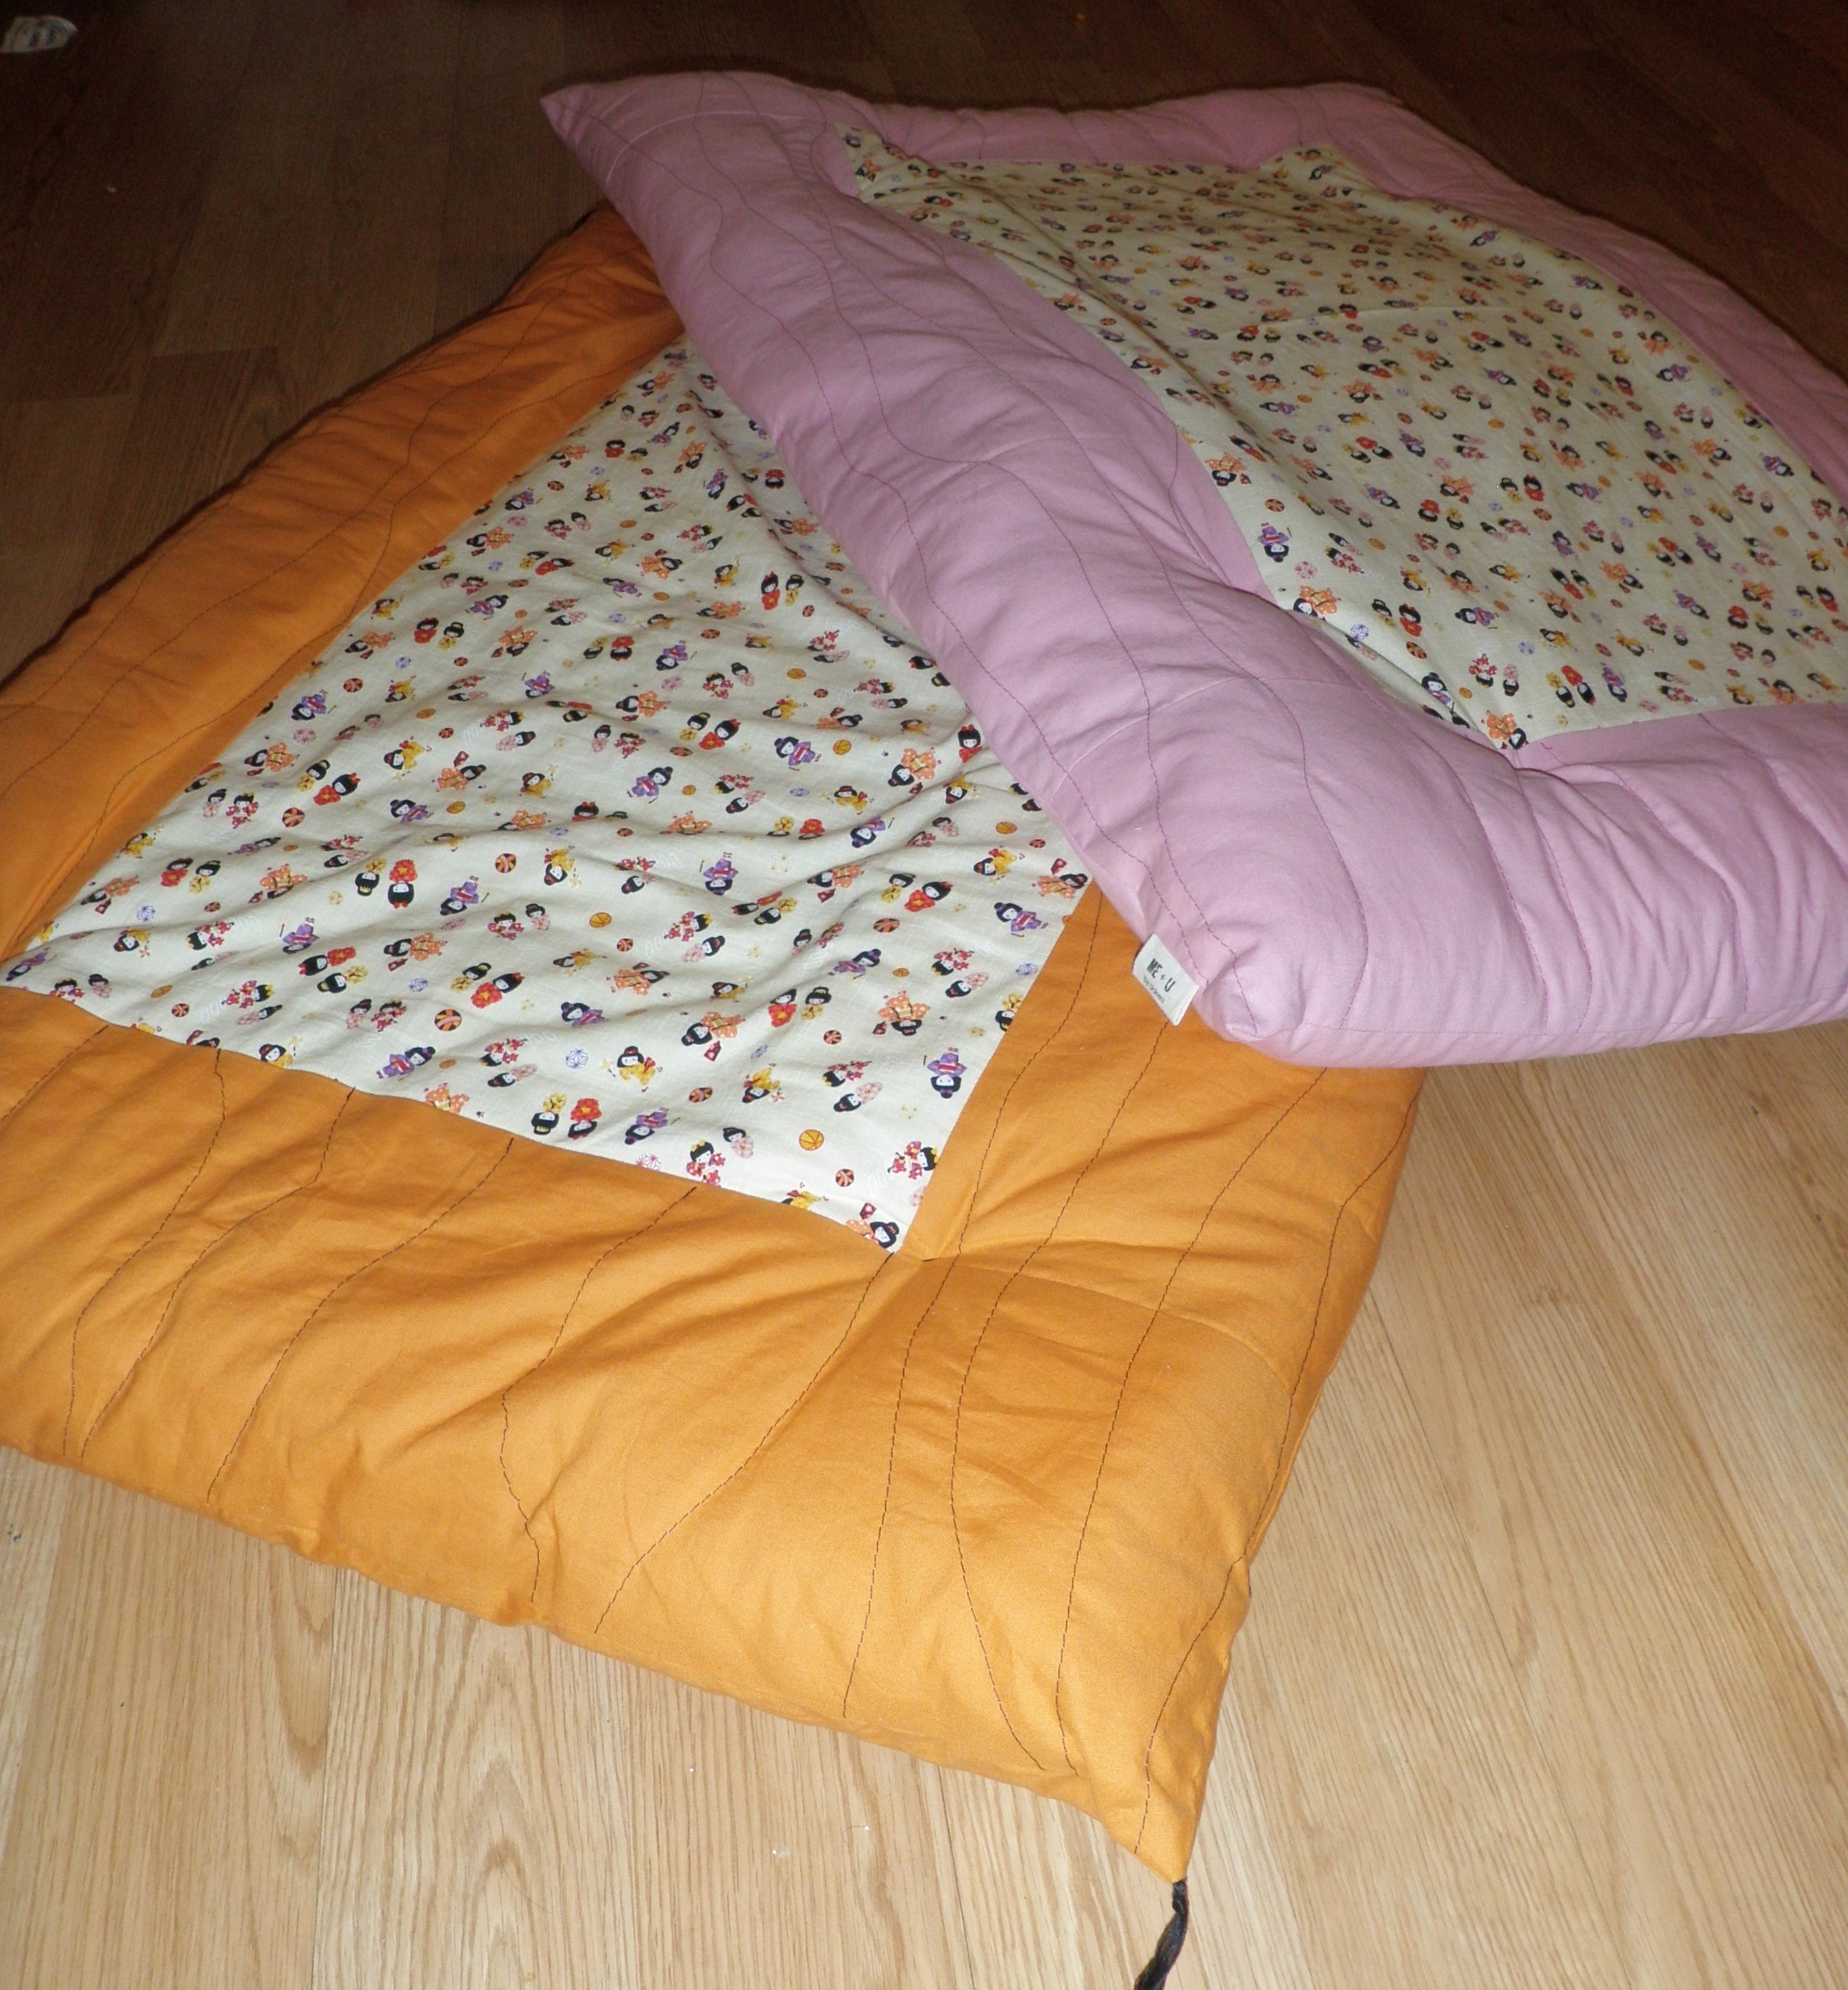 tri fold beach chair bedroom commode uk futon hawaii | roselawnlutheran